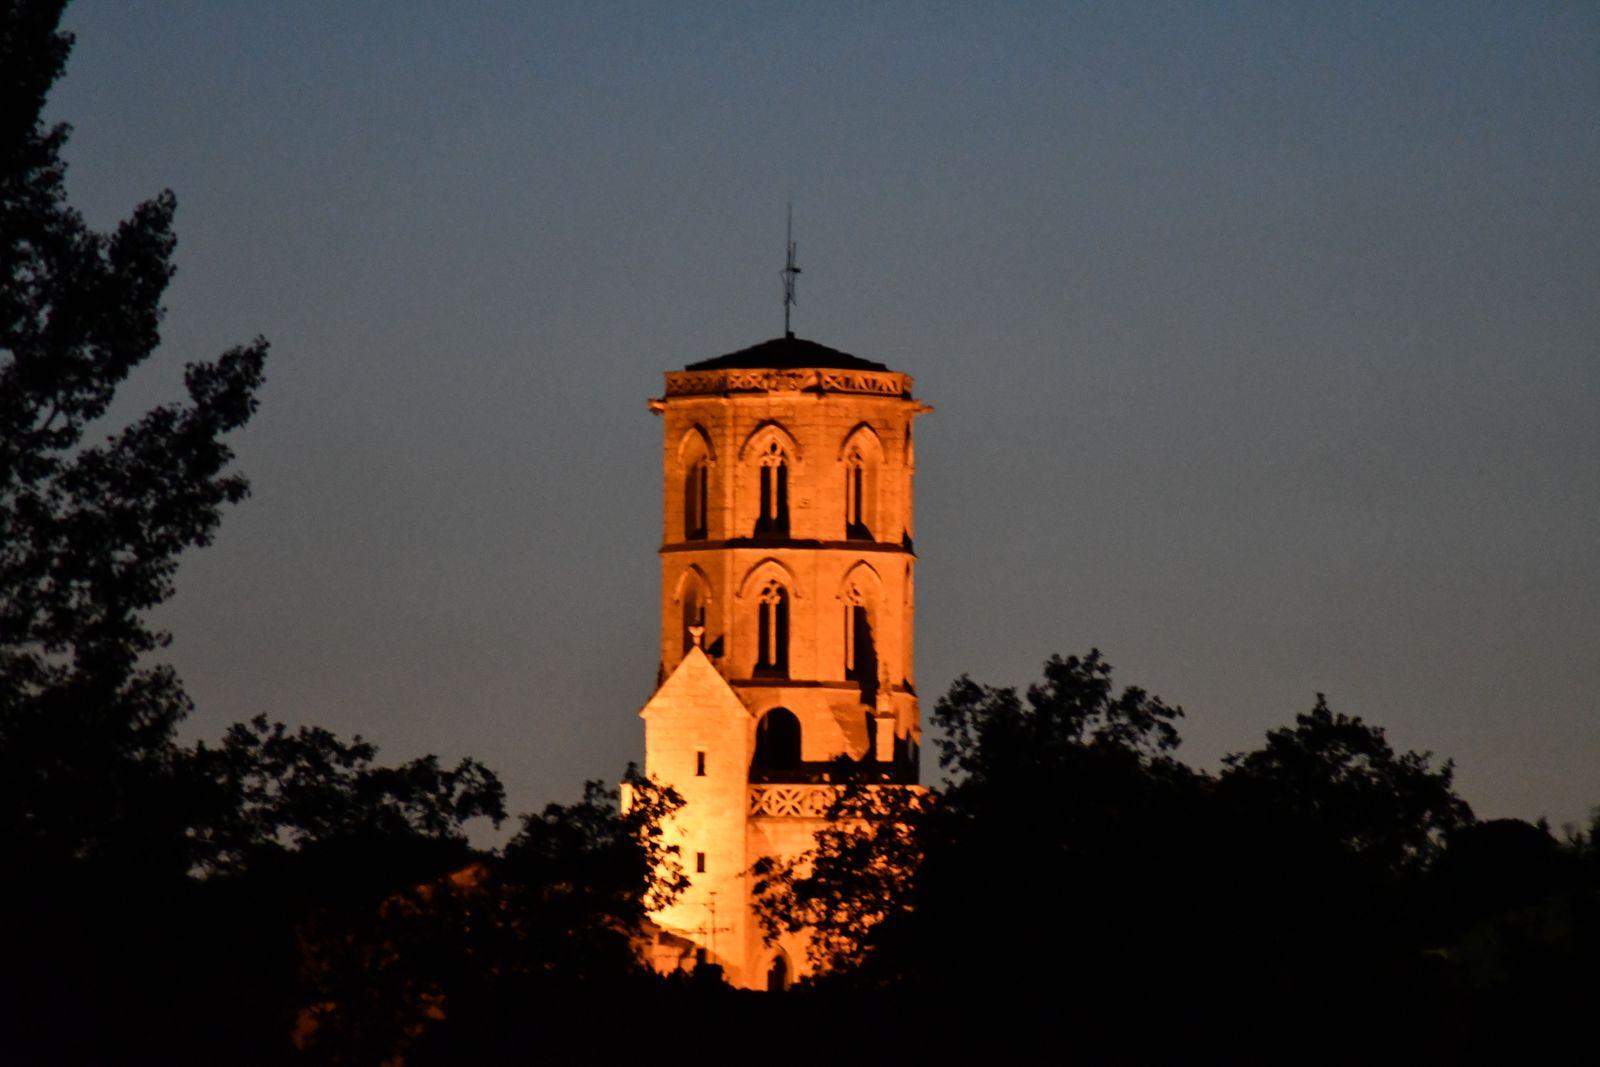 clocher s'illumine